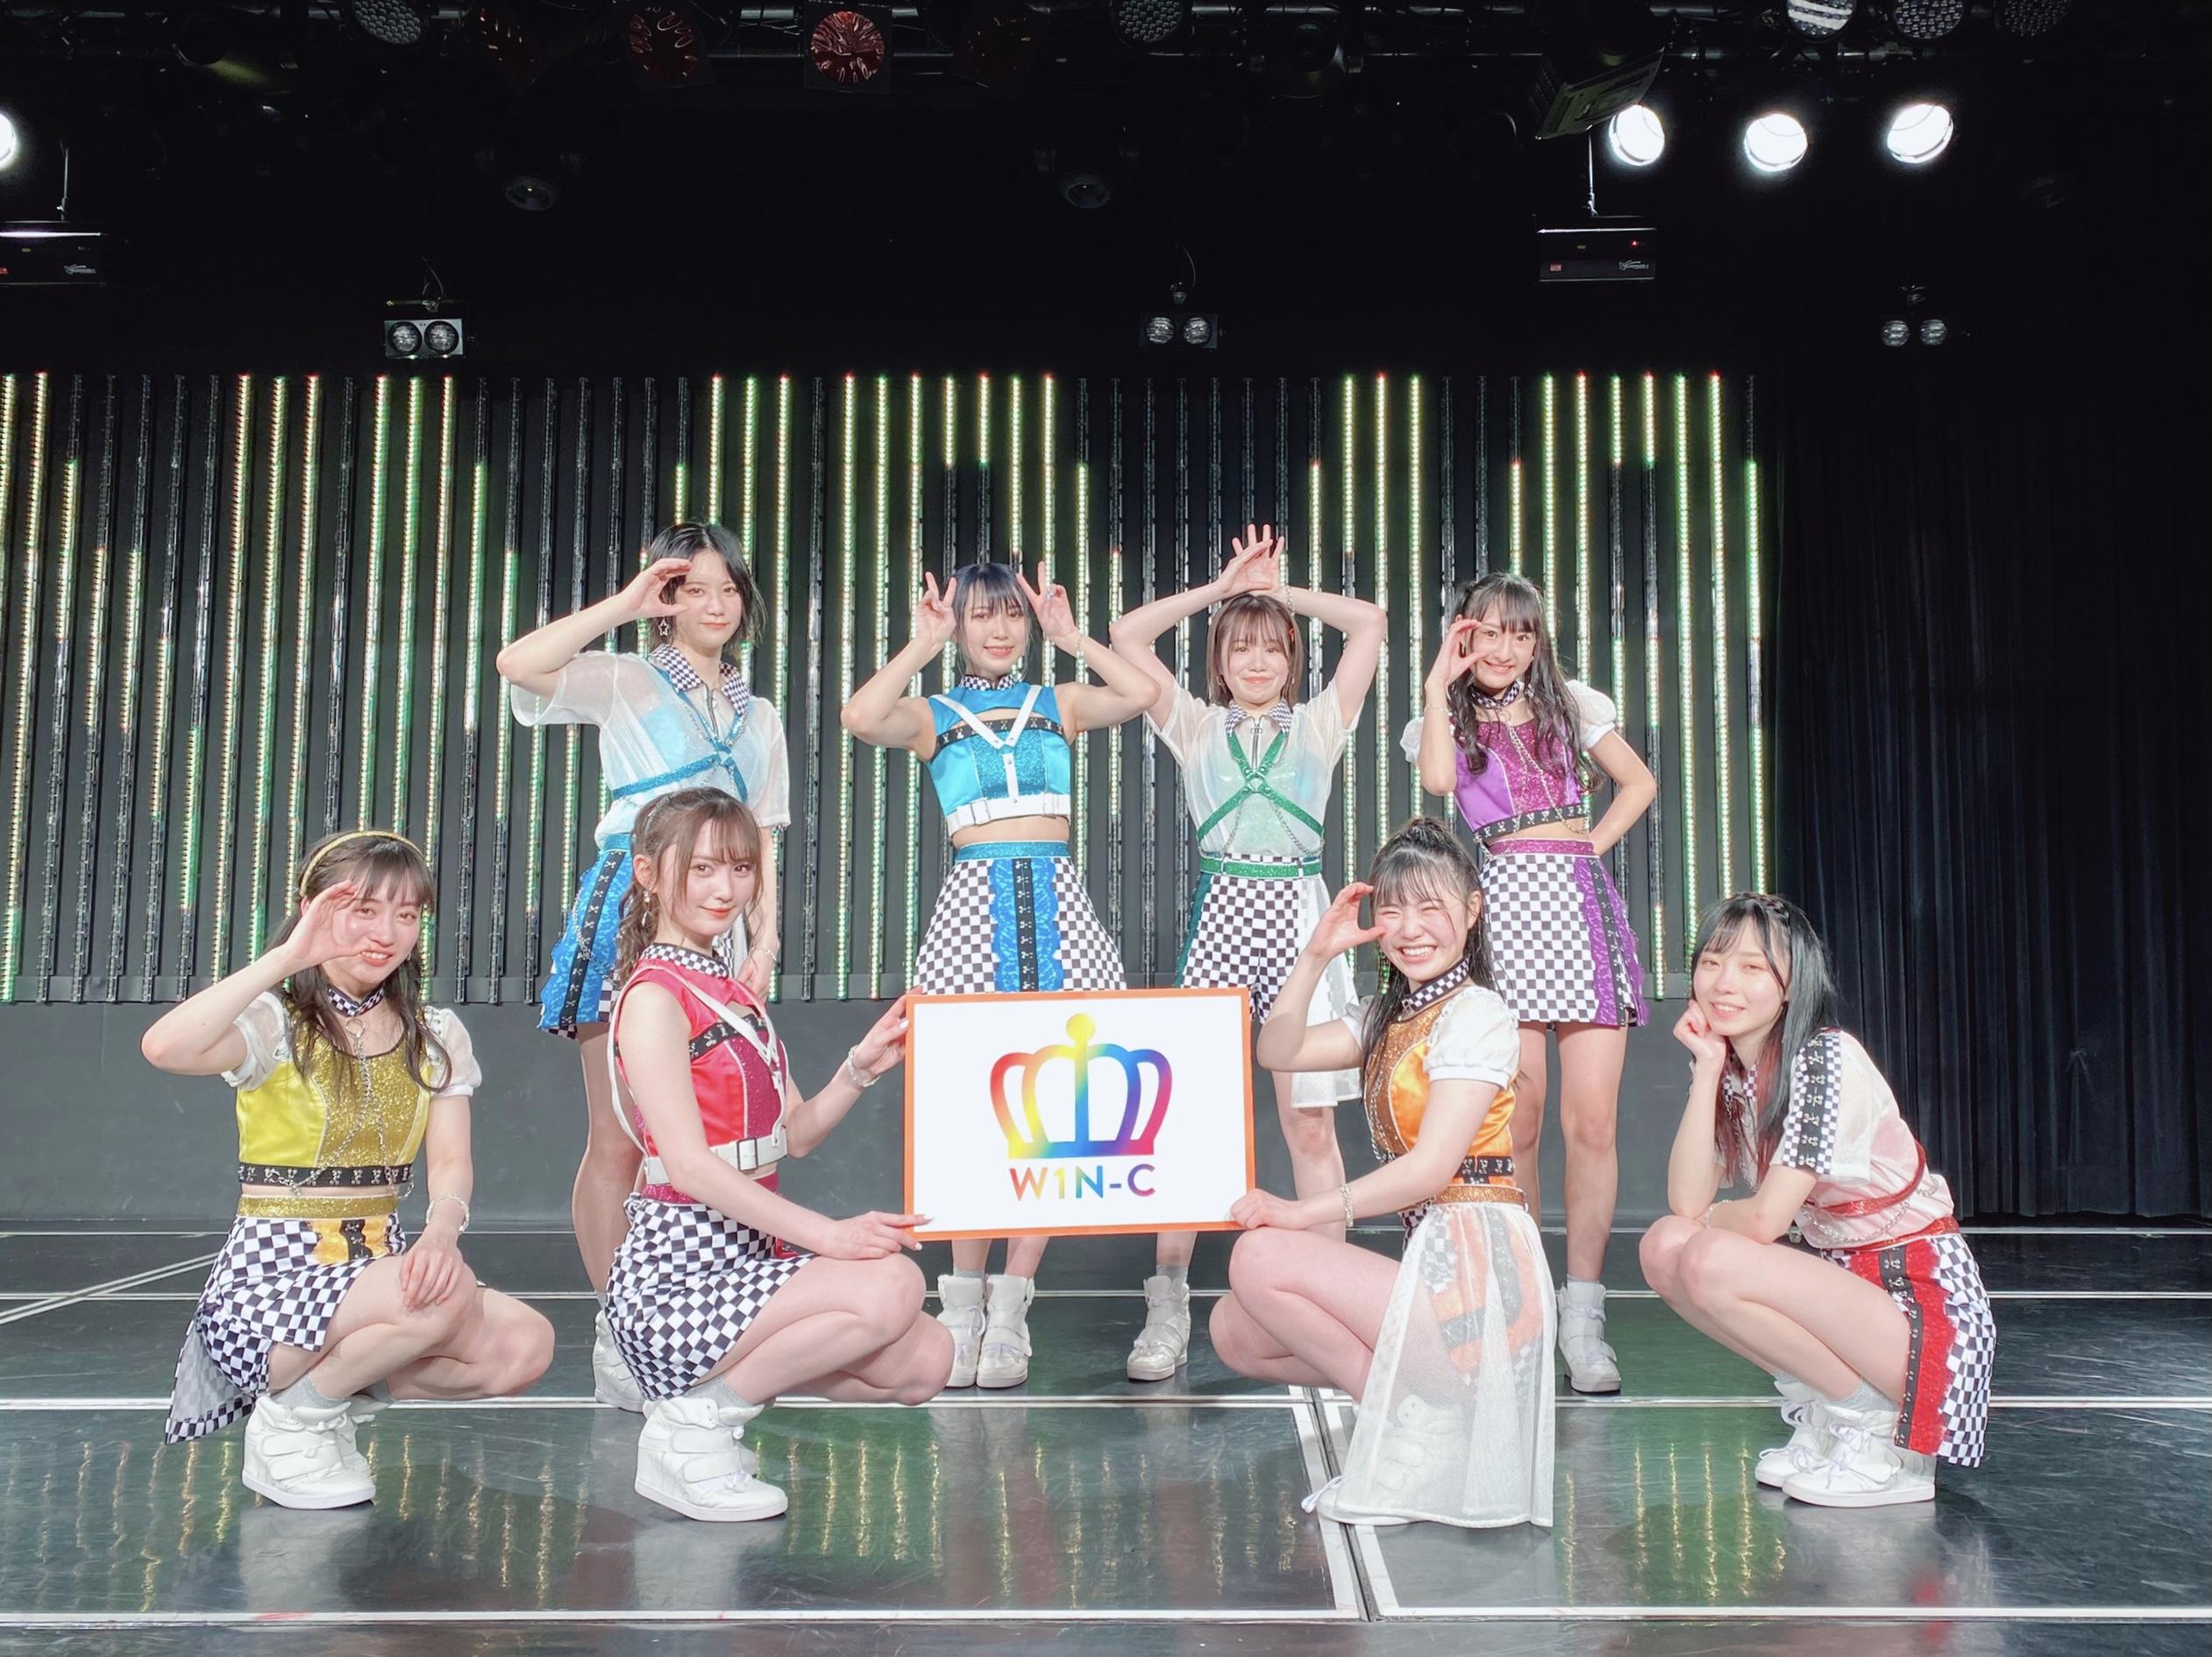 【NMB48】NAMBATTLE公演 ~舞~ W1NーC は231点